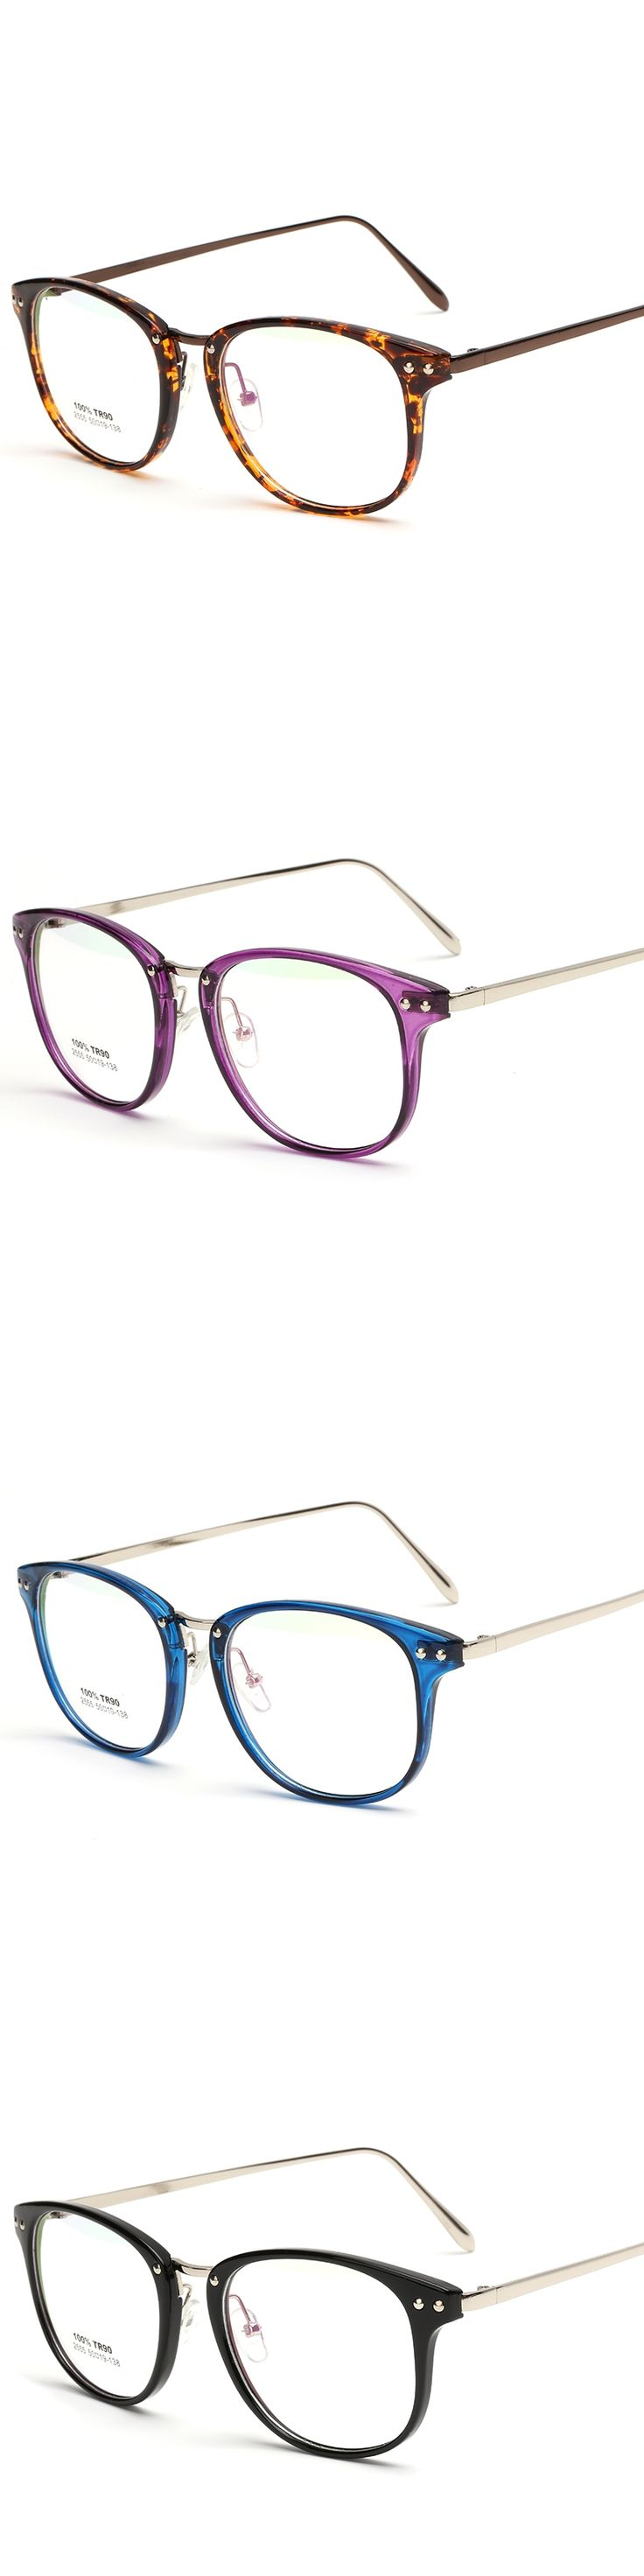 2017 Fashion Unisex  TR90 Highlight Oval Frame Vintage Style High Quality Glasses Frame Laura Fairy LF2555